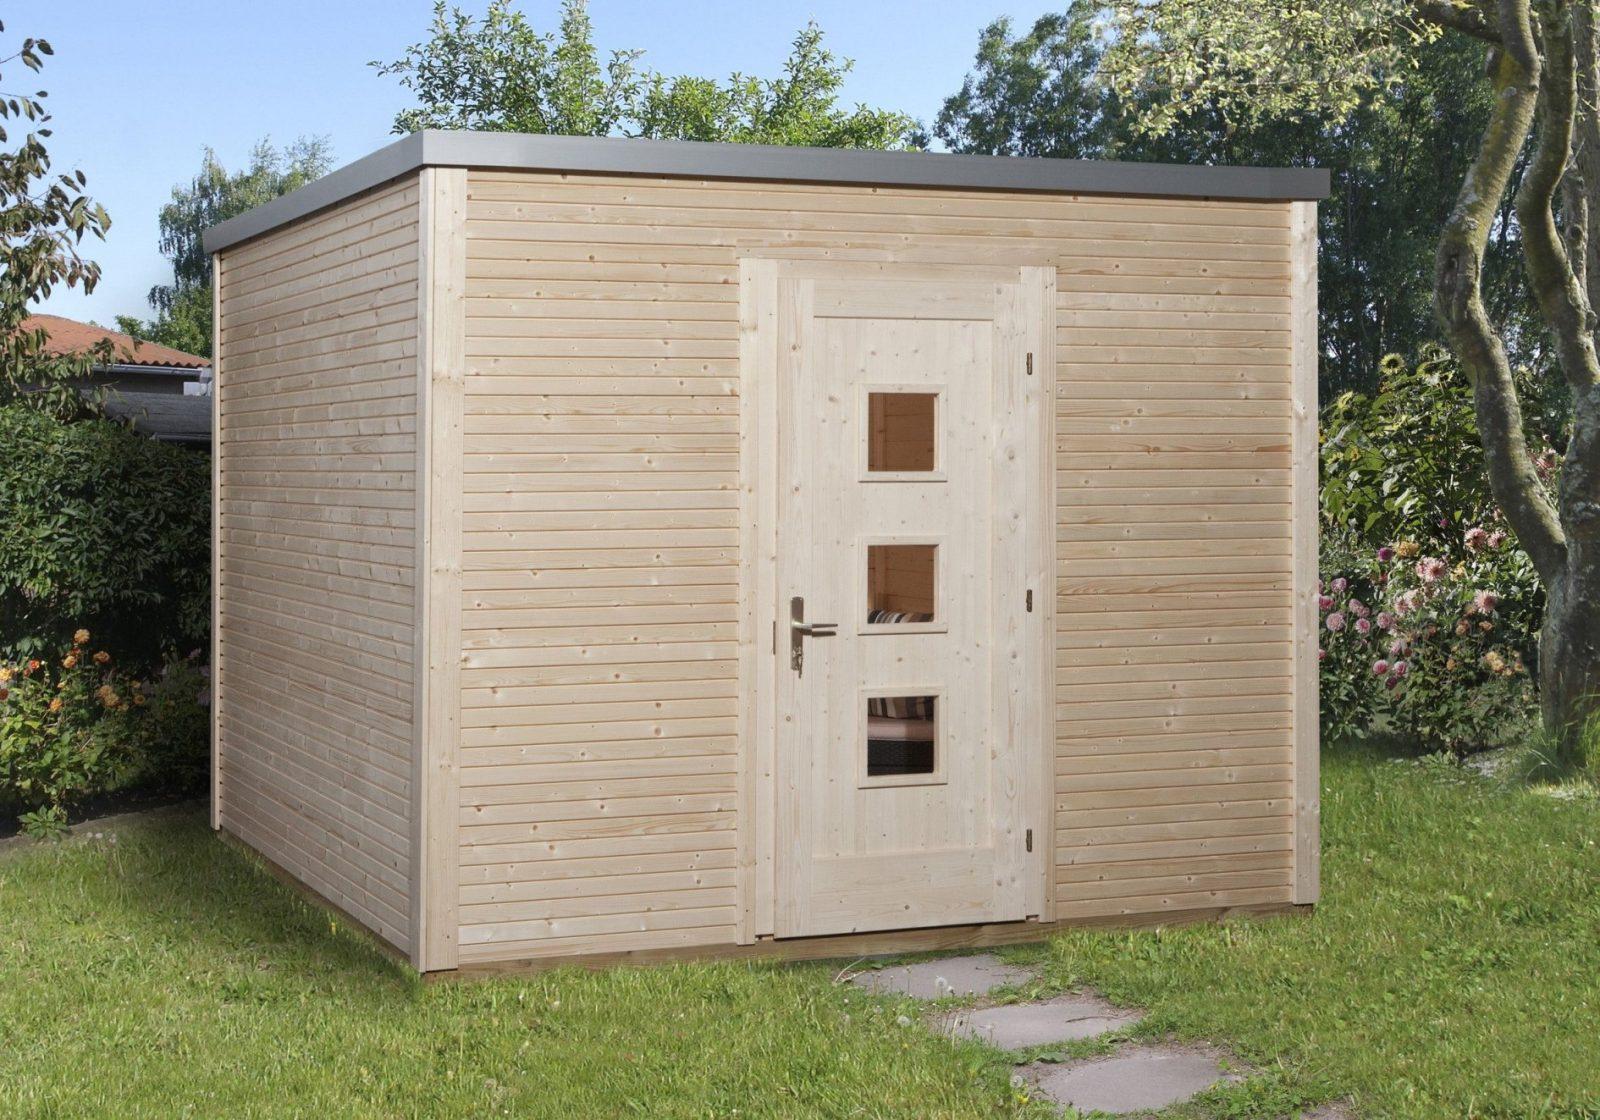 25 Kreativ Gartenhaus Flachdach Selber Bauen Gedanke Haus Design von Gartenhaus Ytong Selber Bauen Bild